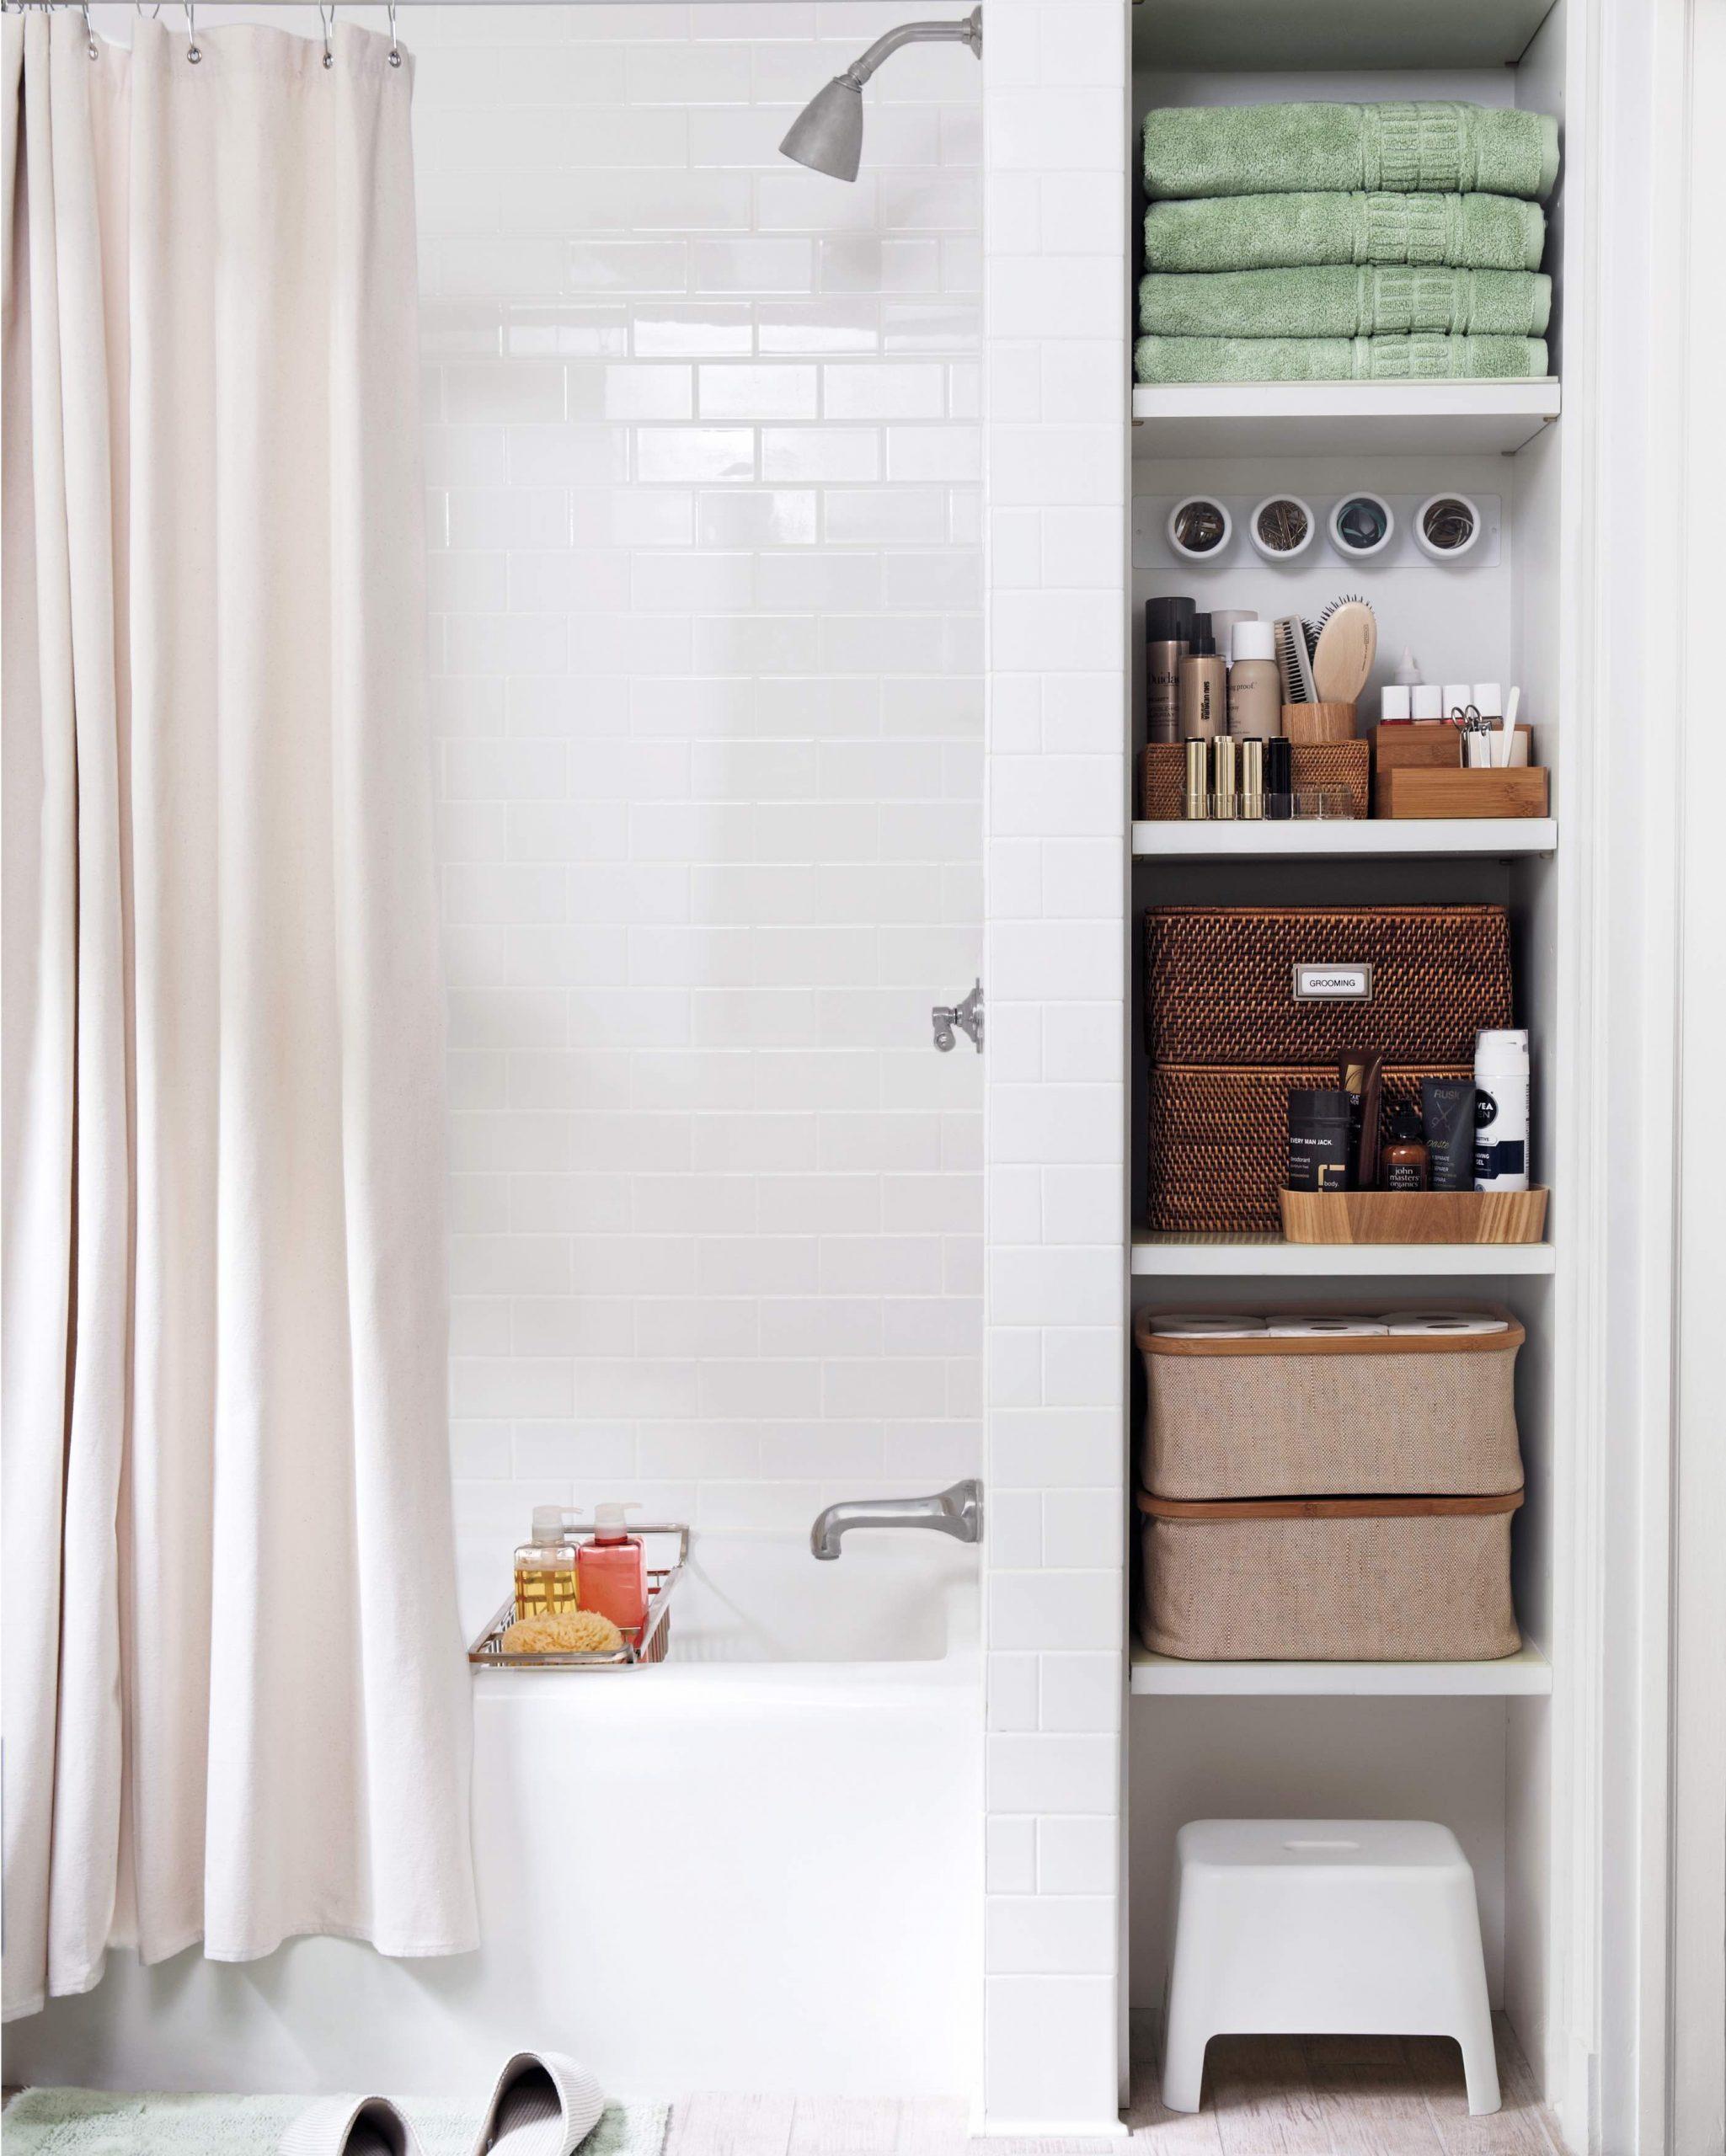 35 Bathroom Storage Ideas Vanity Cupboards Baskets And More